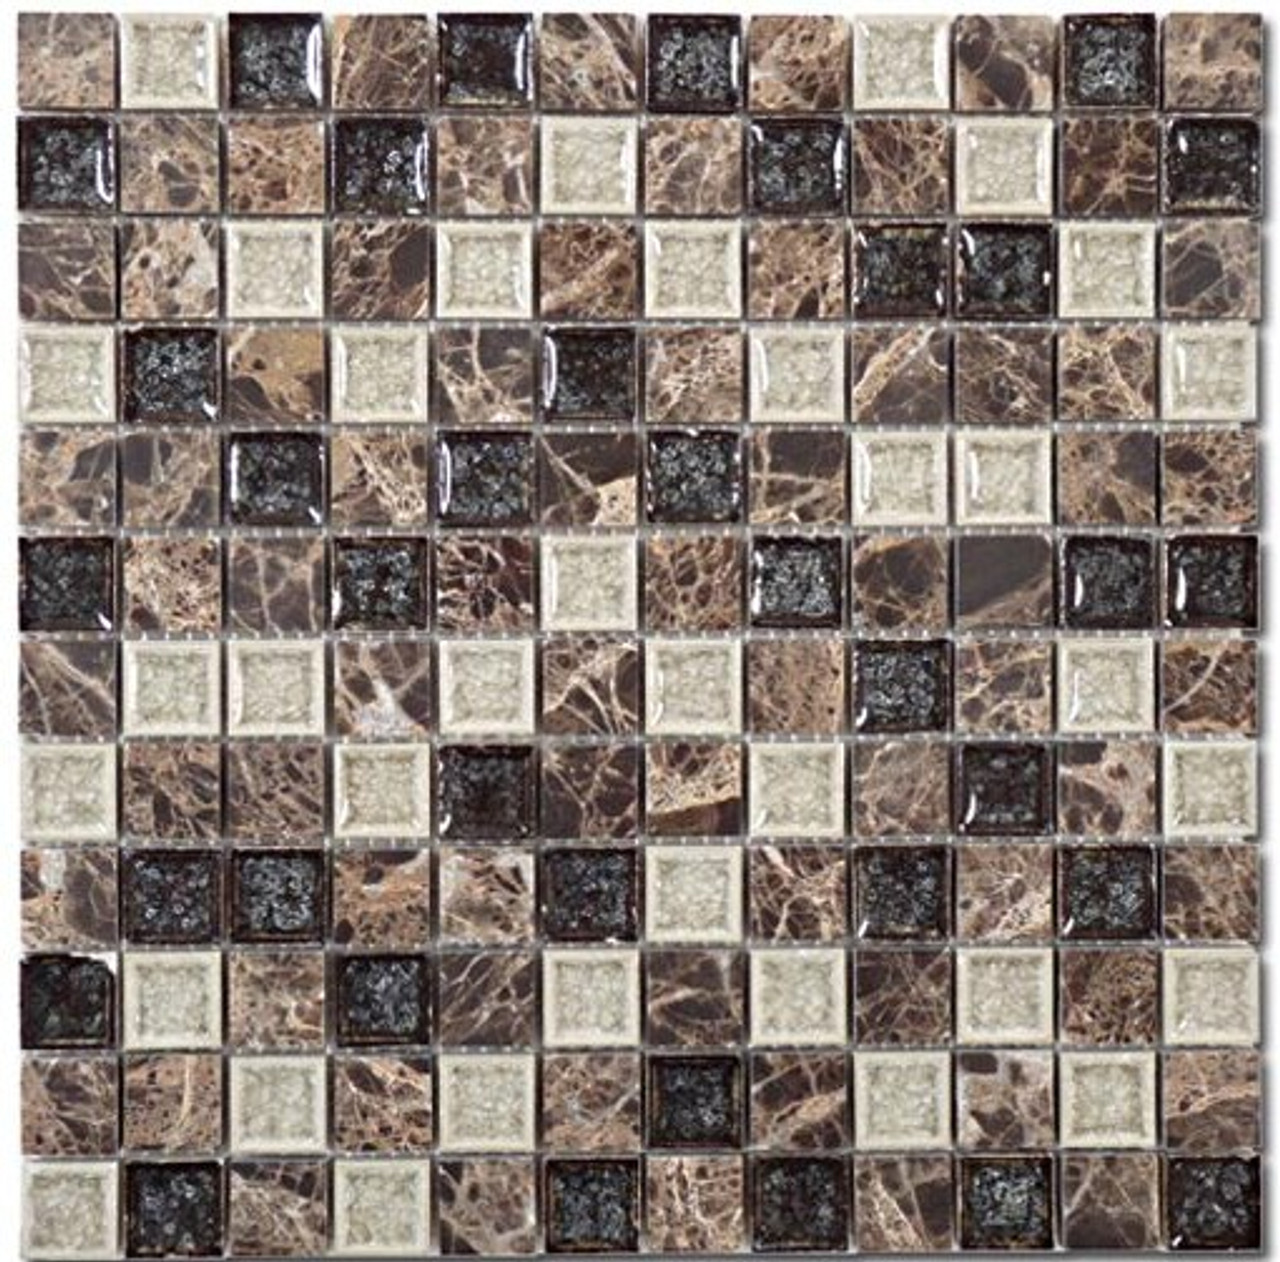 Bella Glass Tiles Tranquil Series 1 x 1 Chocolate Blend